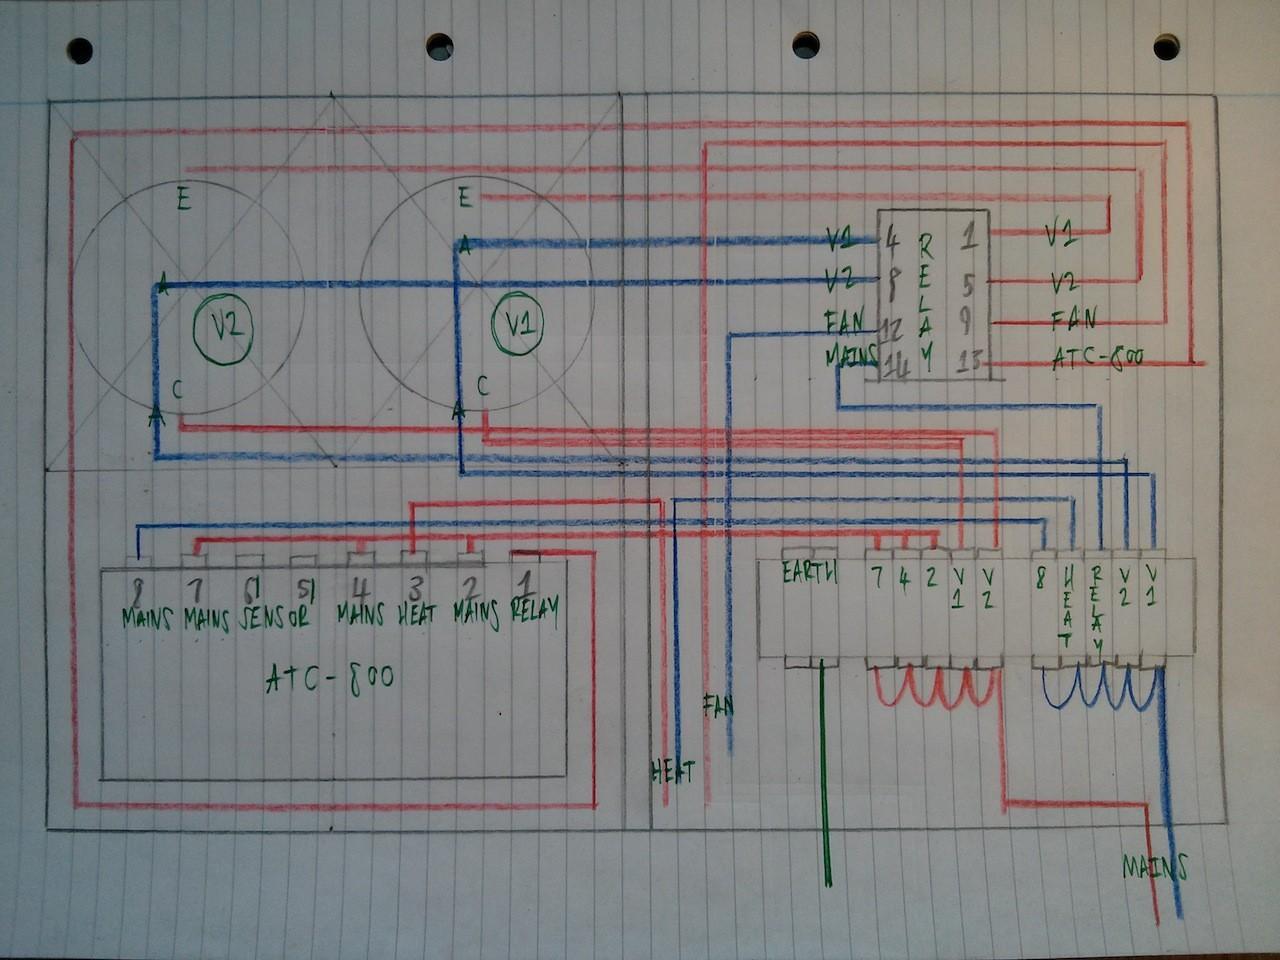 Variac Fan Controller Wiring Diagram Wikie Cloud Design